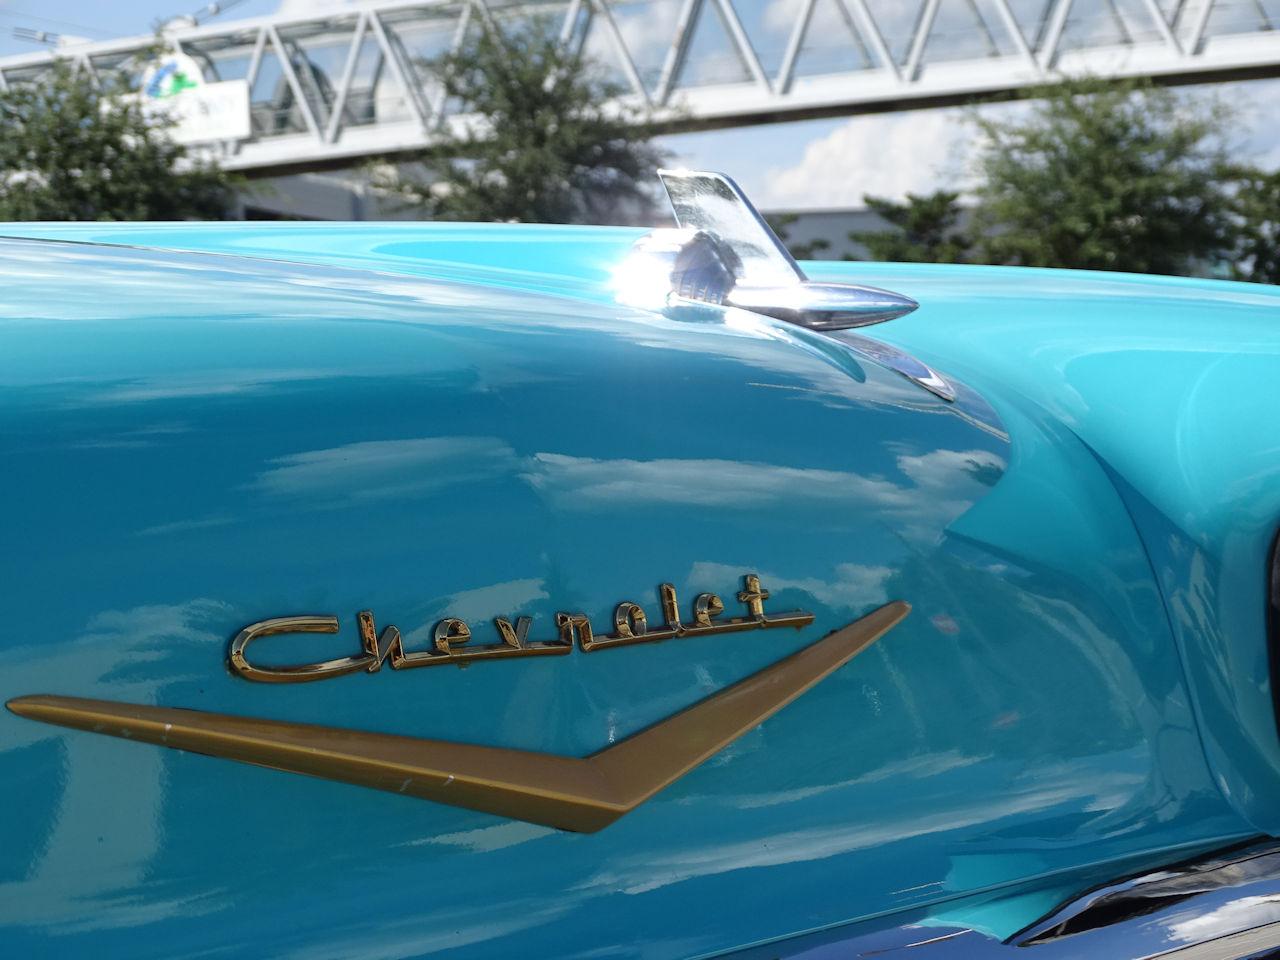 1957 Chevrolet Bel Air 89